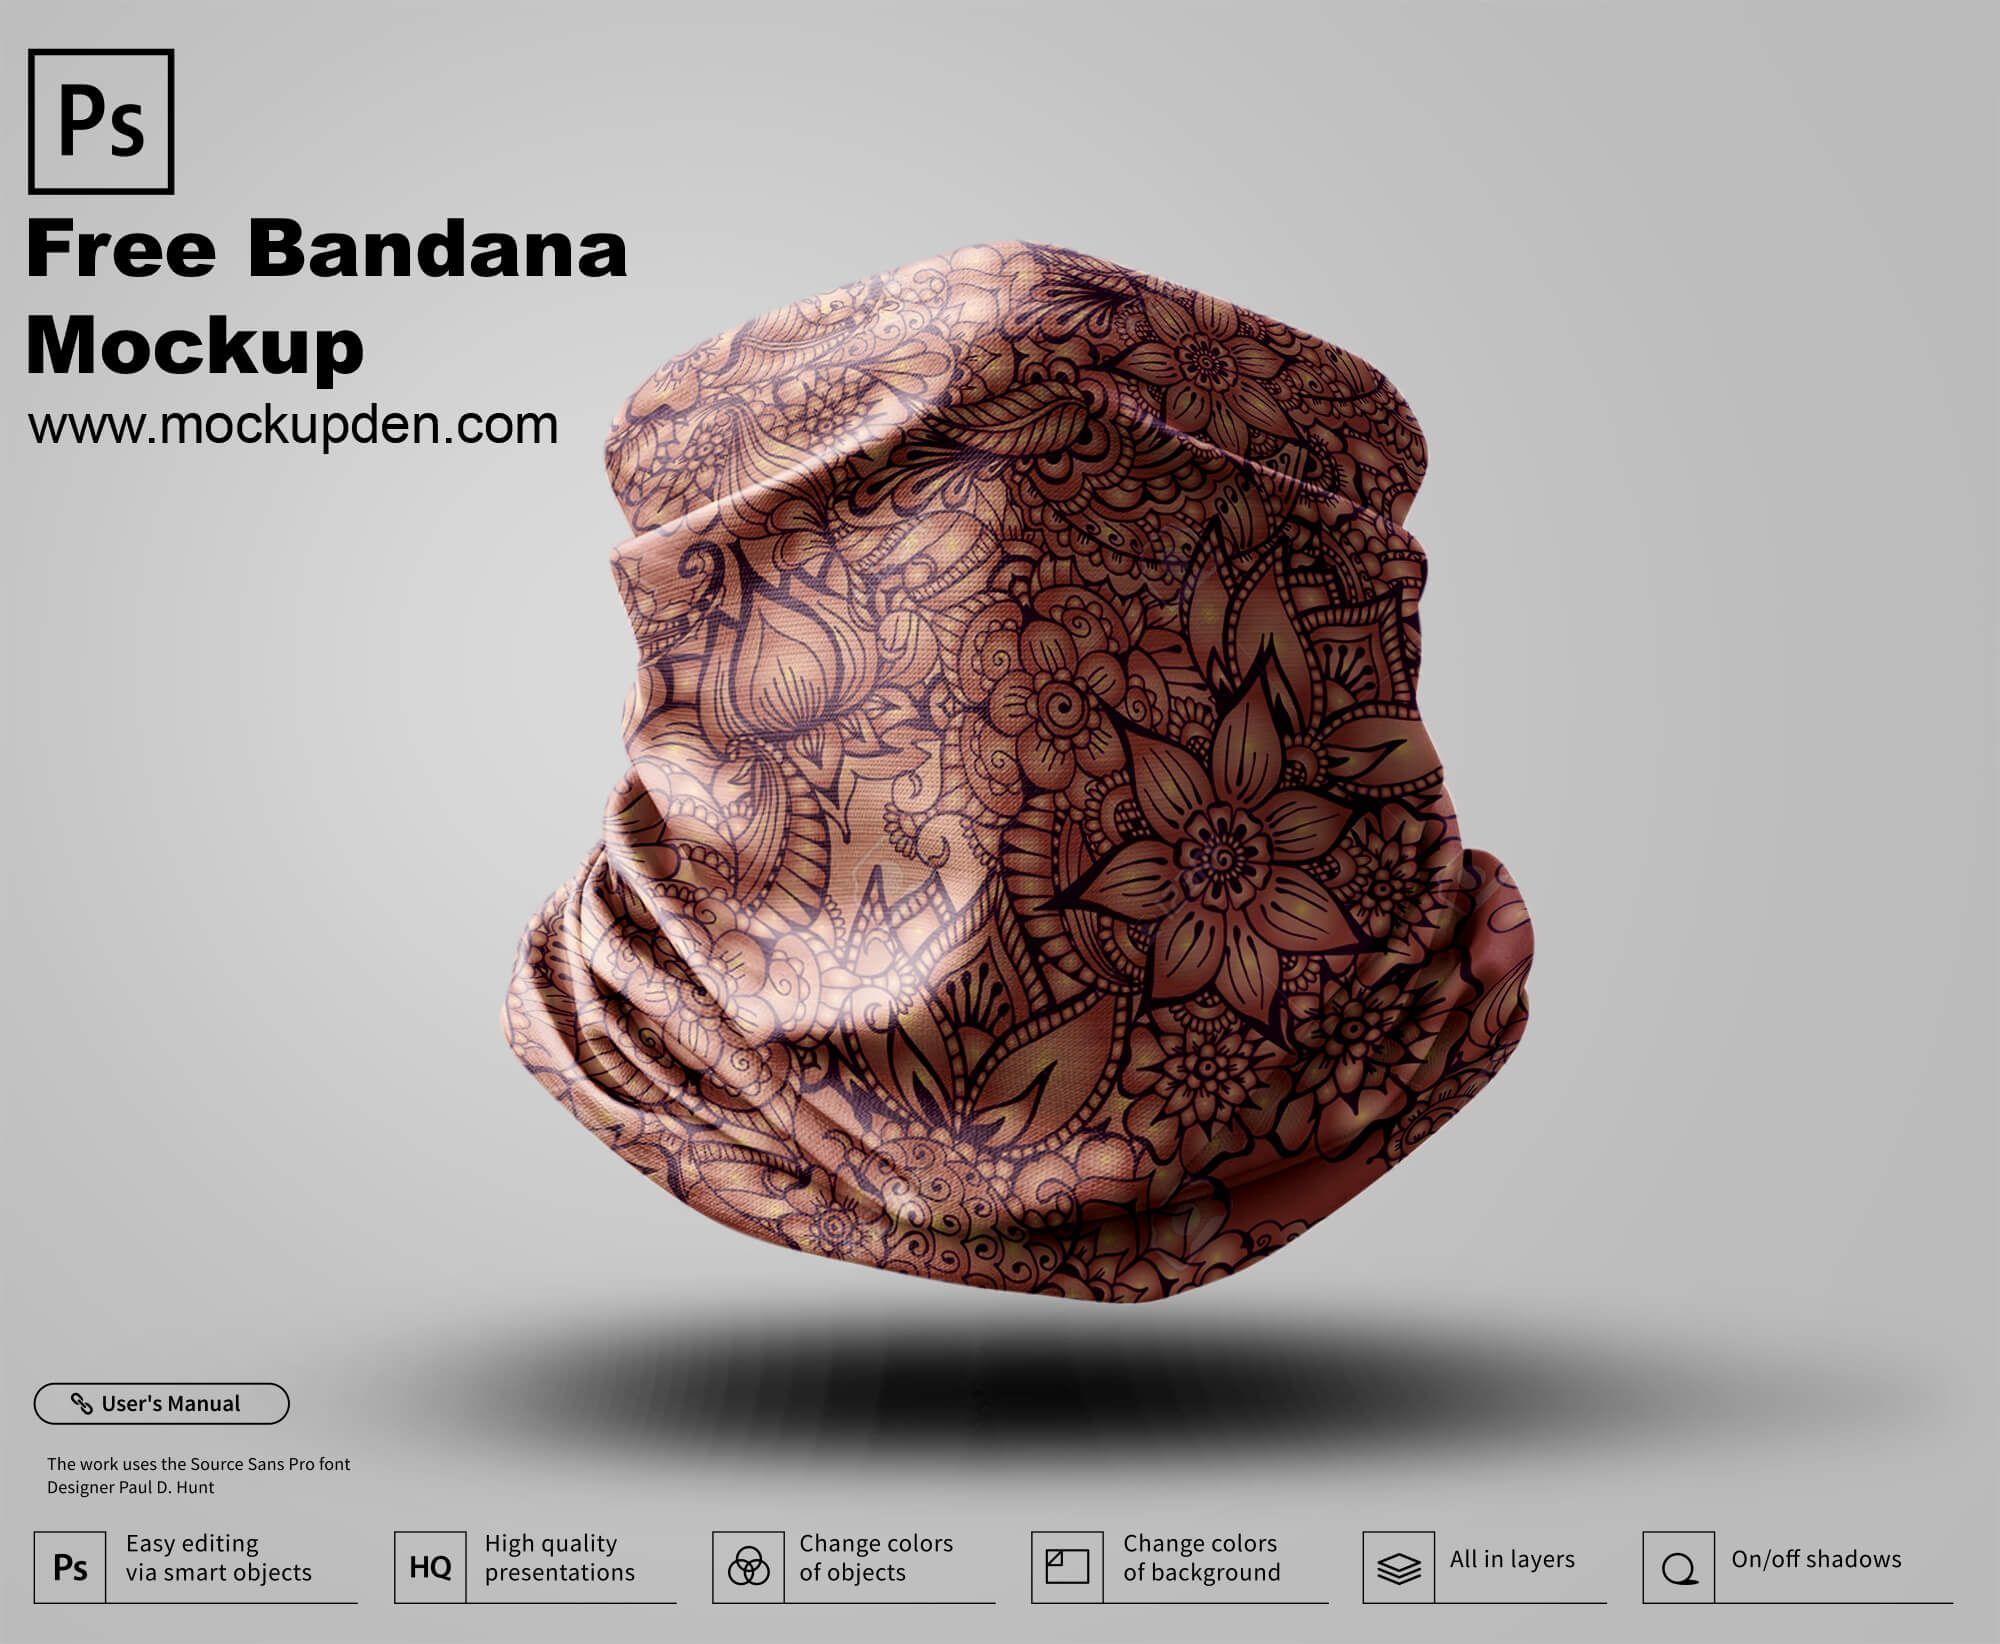 Free Bandana Mockup Psd Template In 2021 Mockup Psd Mockup Psd Templates